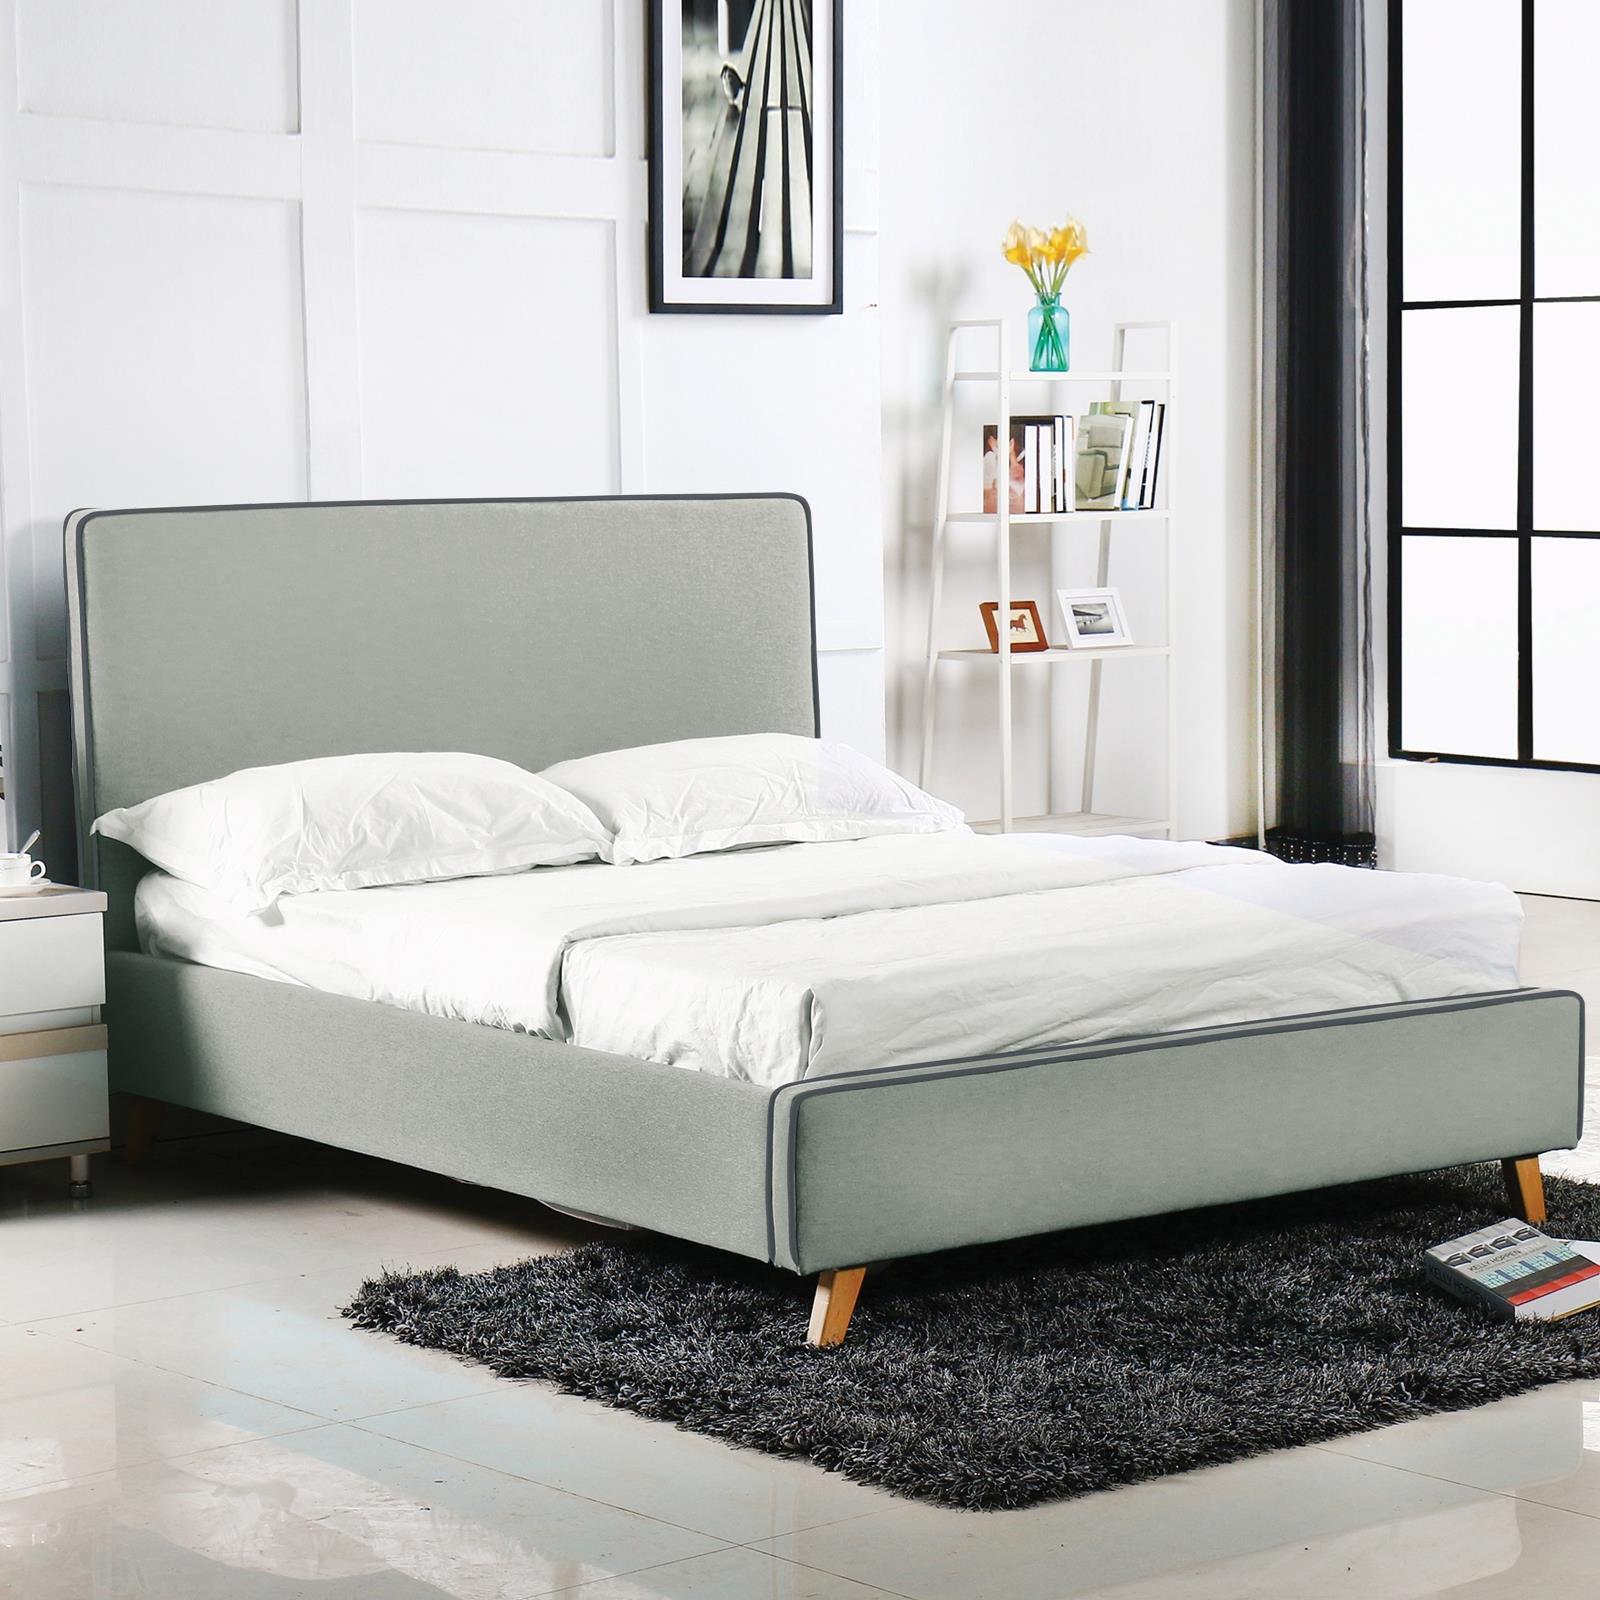 MORISSON κρεβάτι διπλό ανοιχτό γκρι Y110x216x171εκ. (στρώμα 160x200εκ.)